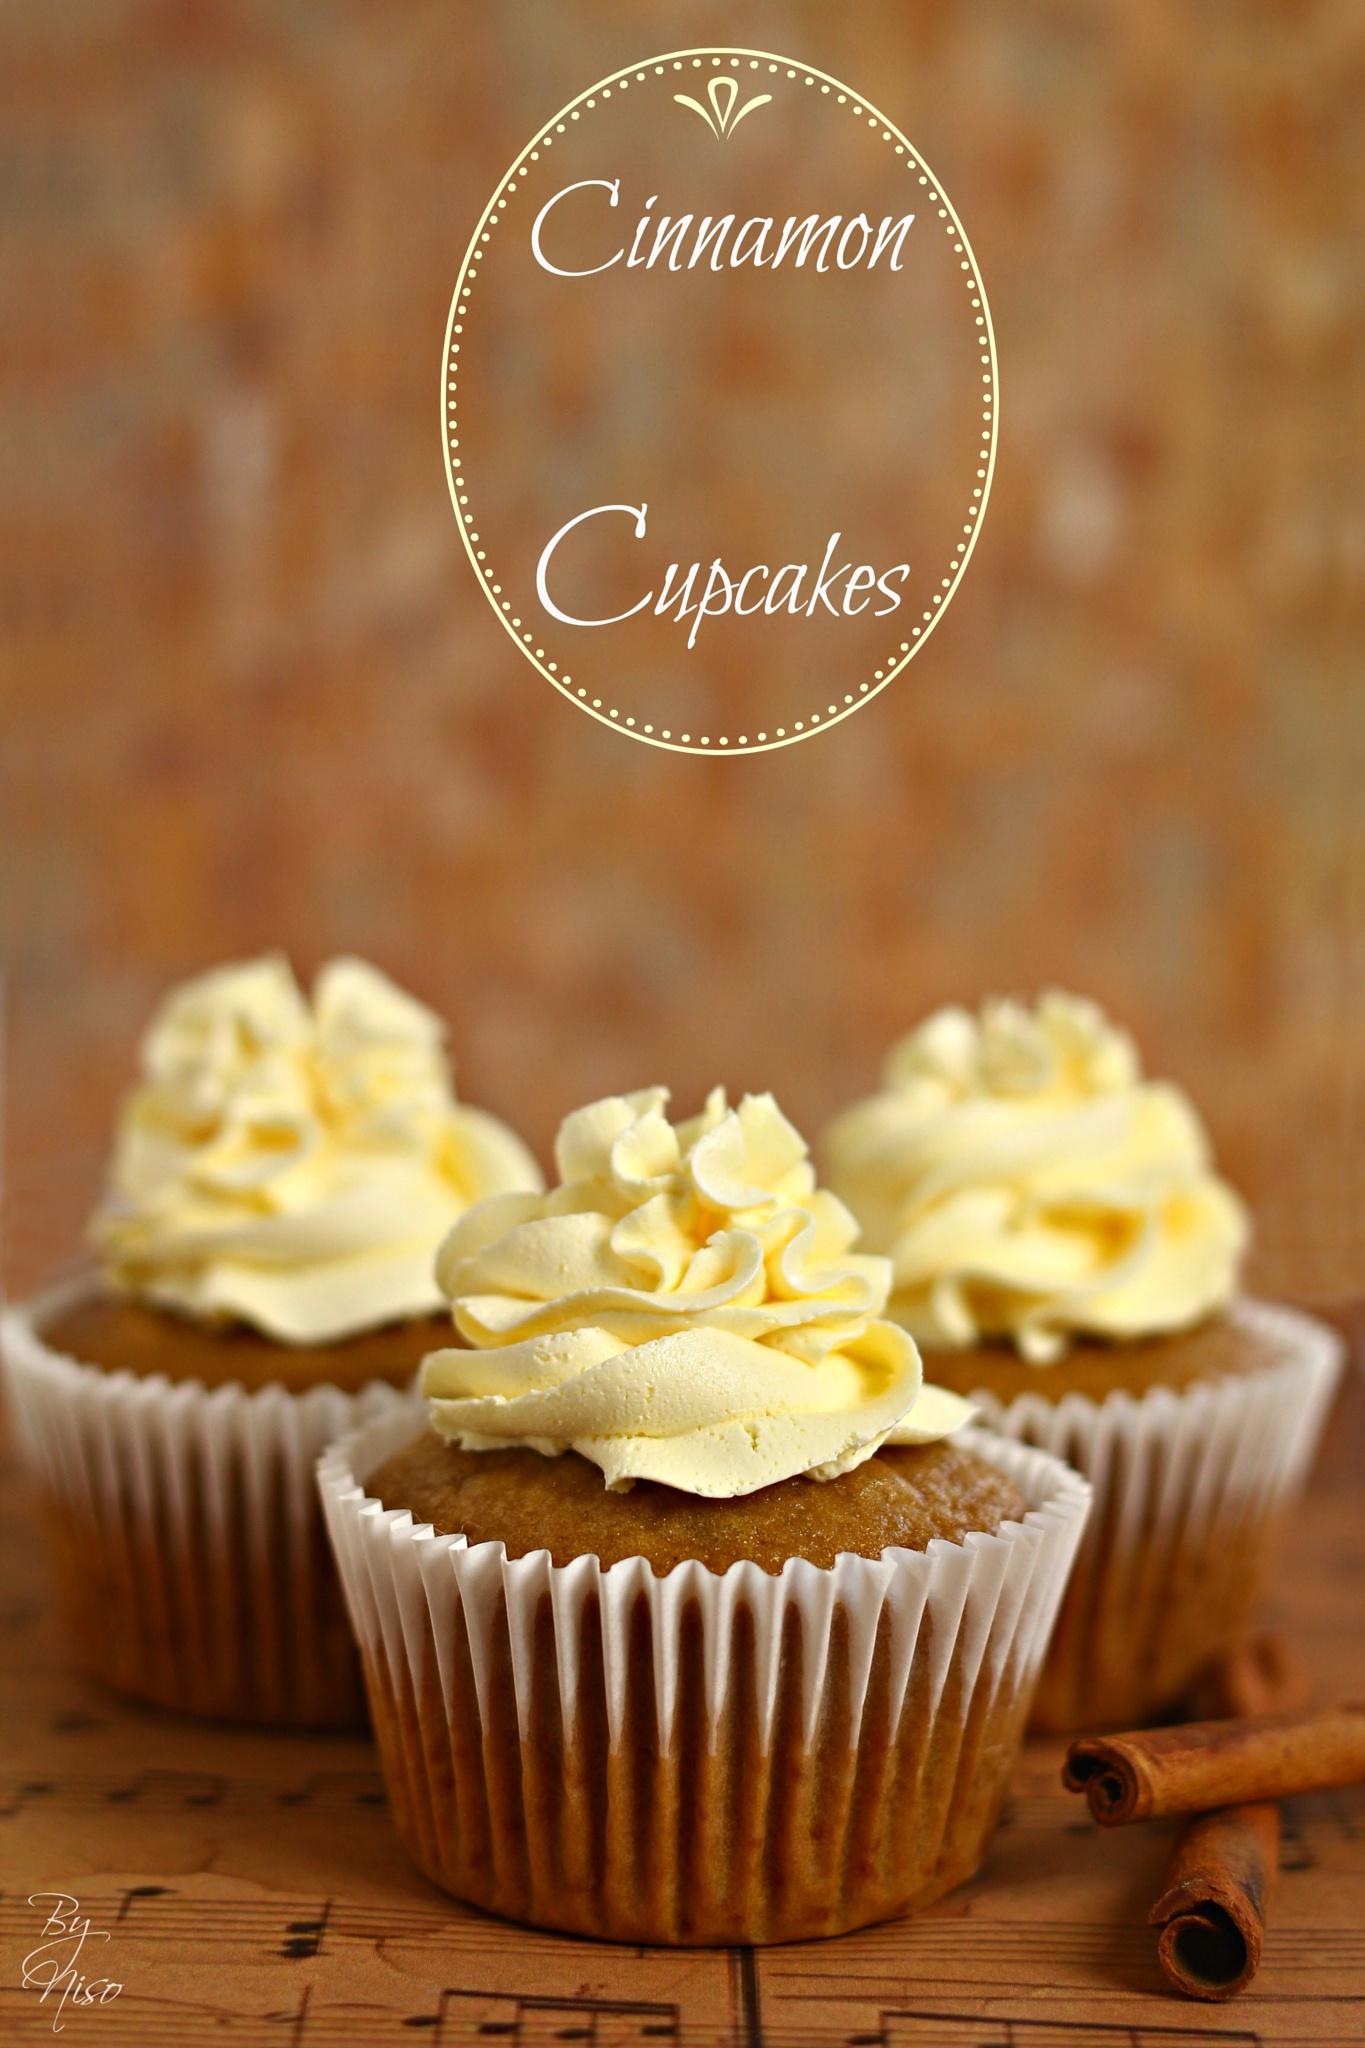 Cinnamon cupcakes by Nisreen Rahhal